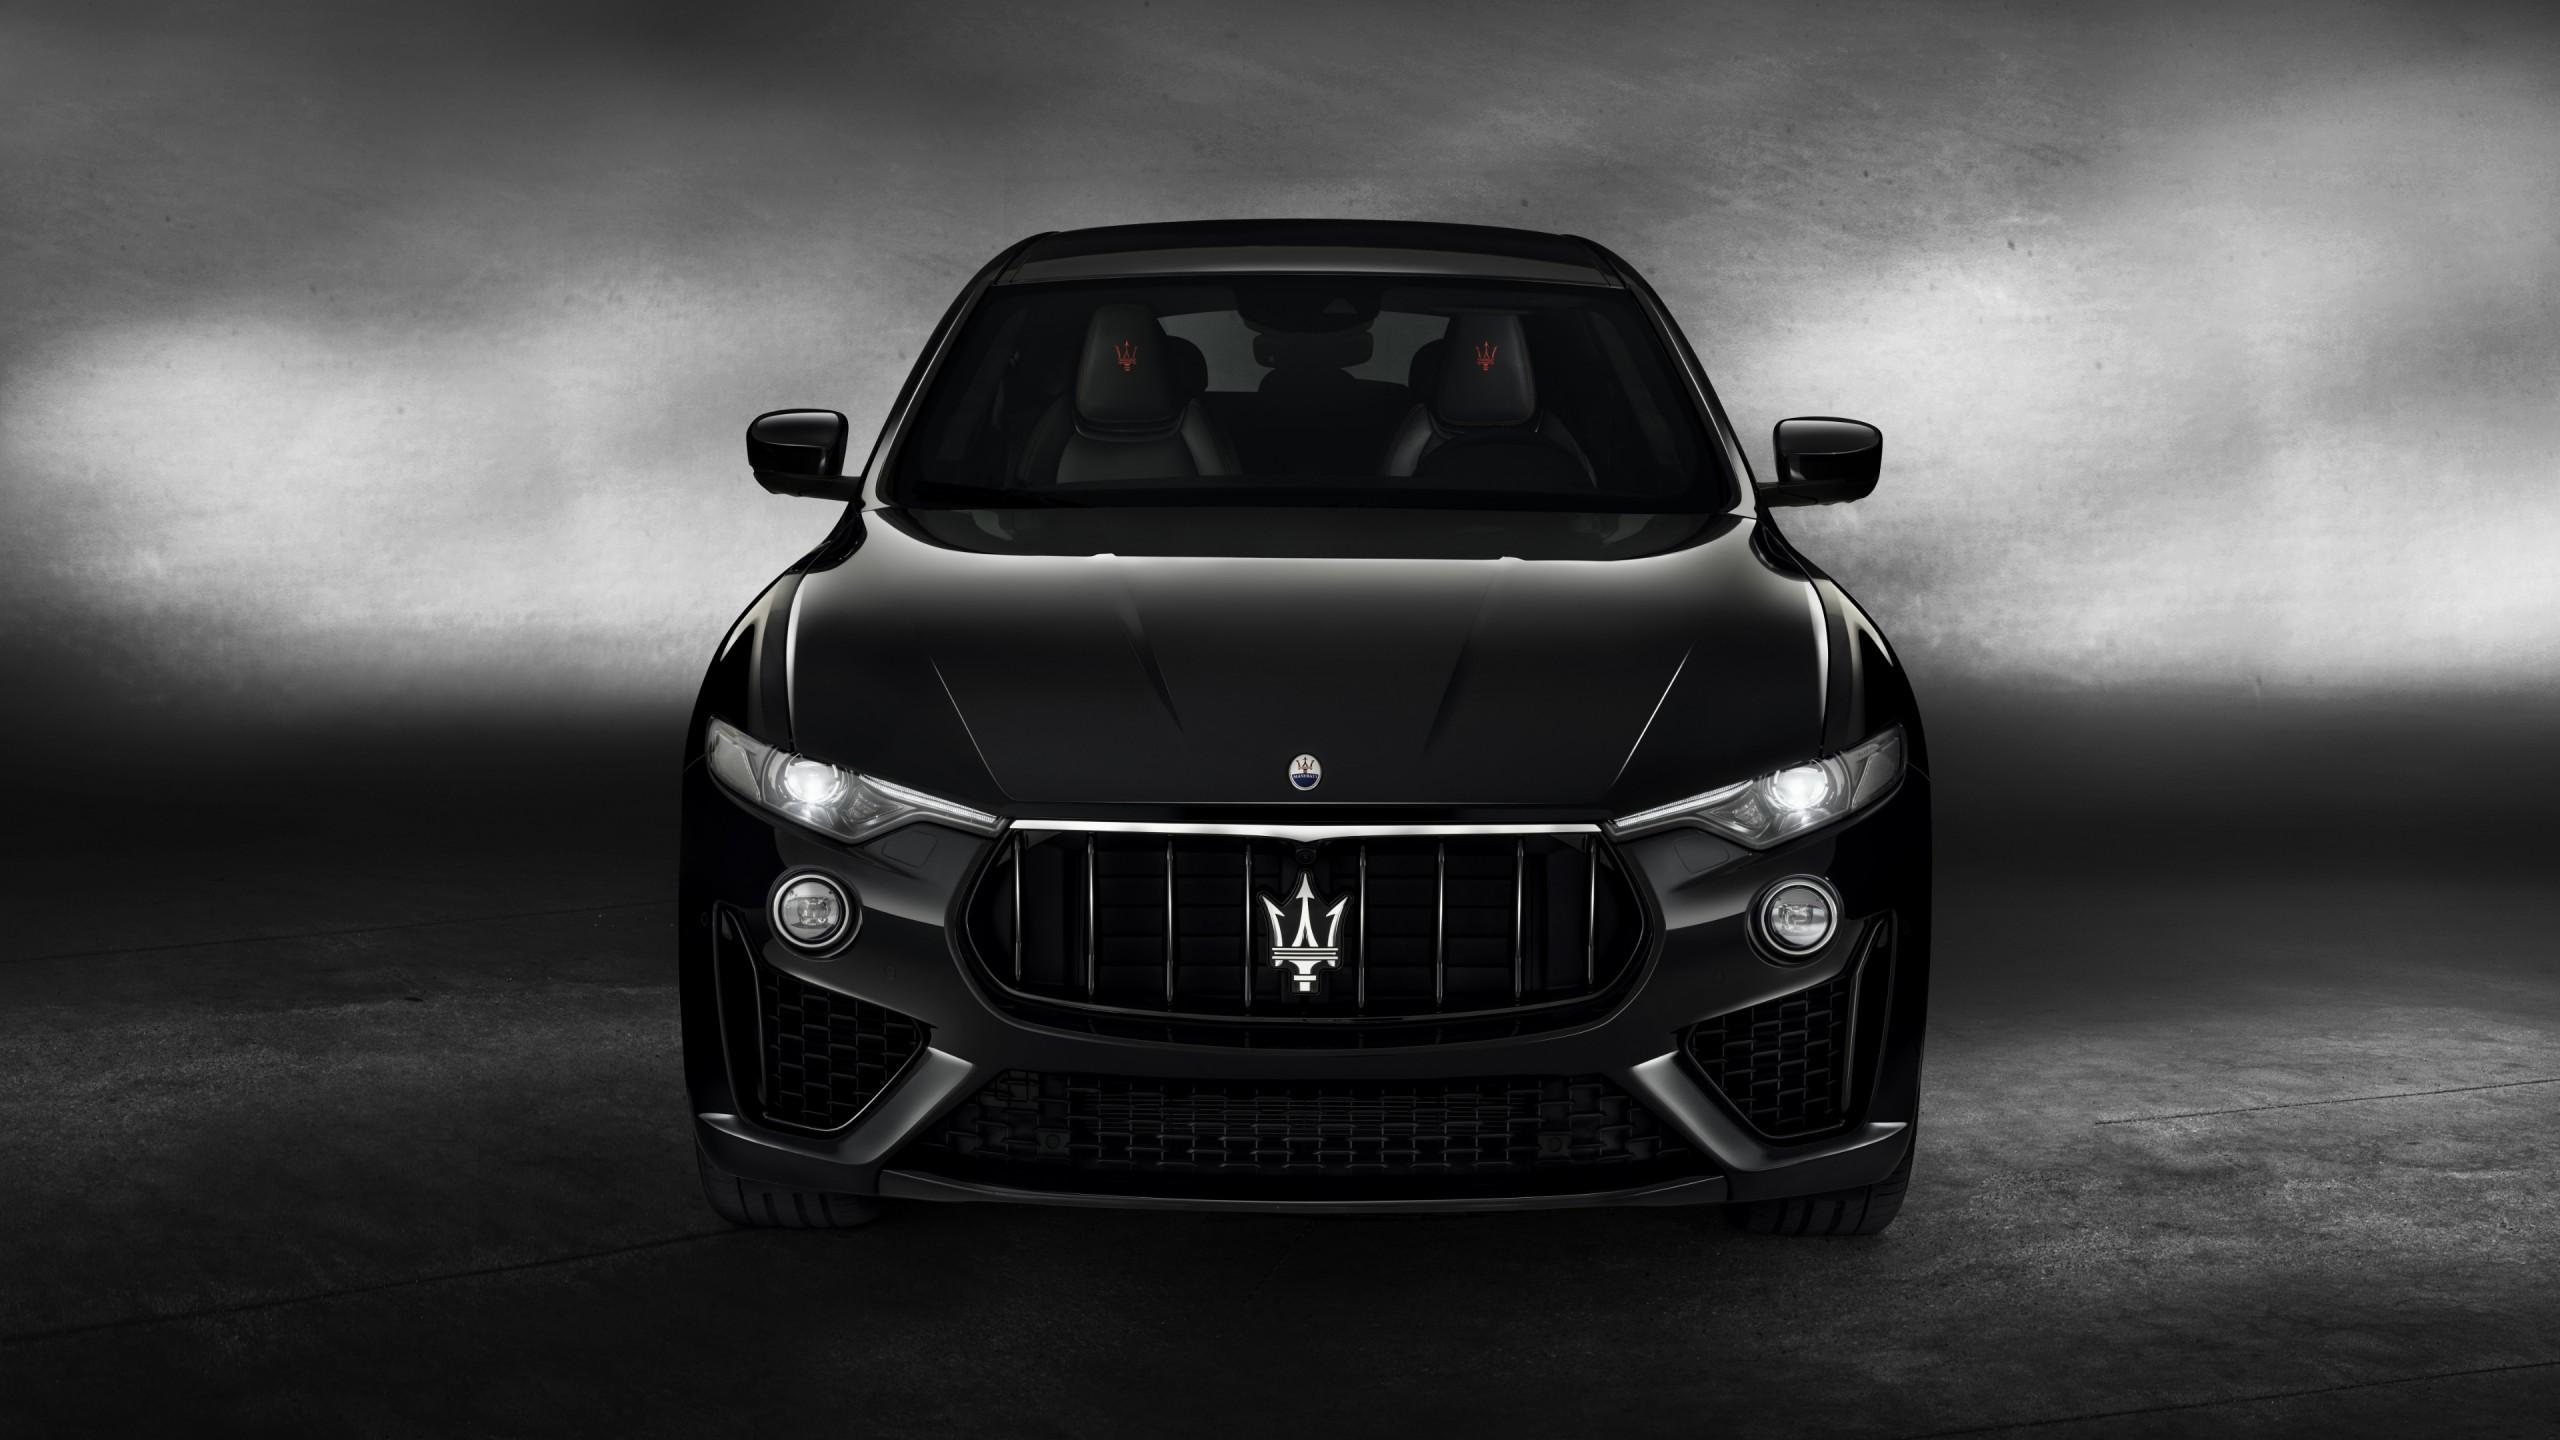 2018 maserati levante s q4 gransport 4k wallpaper hd car wallpapers id 10868 - Maserati levante wallpaper ...